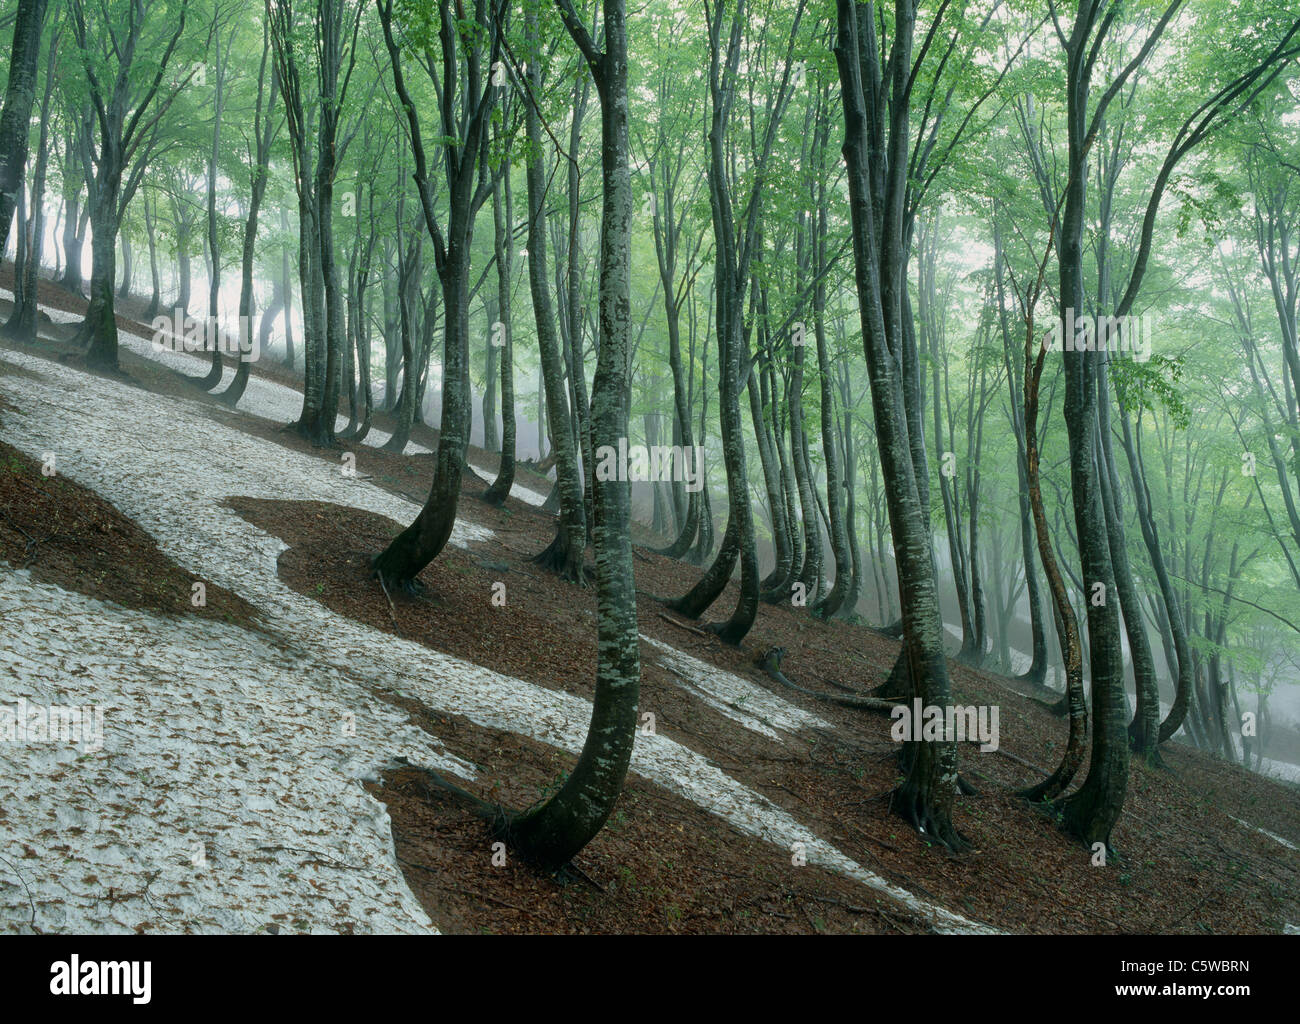 Beech Forest of Amamizukoshi, Tokamachi, Niigata, Japan - Stock Image